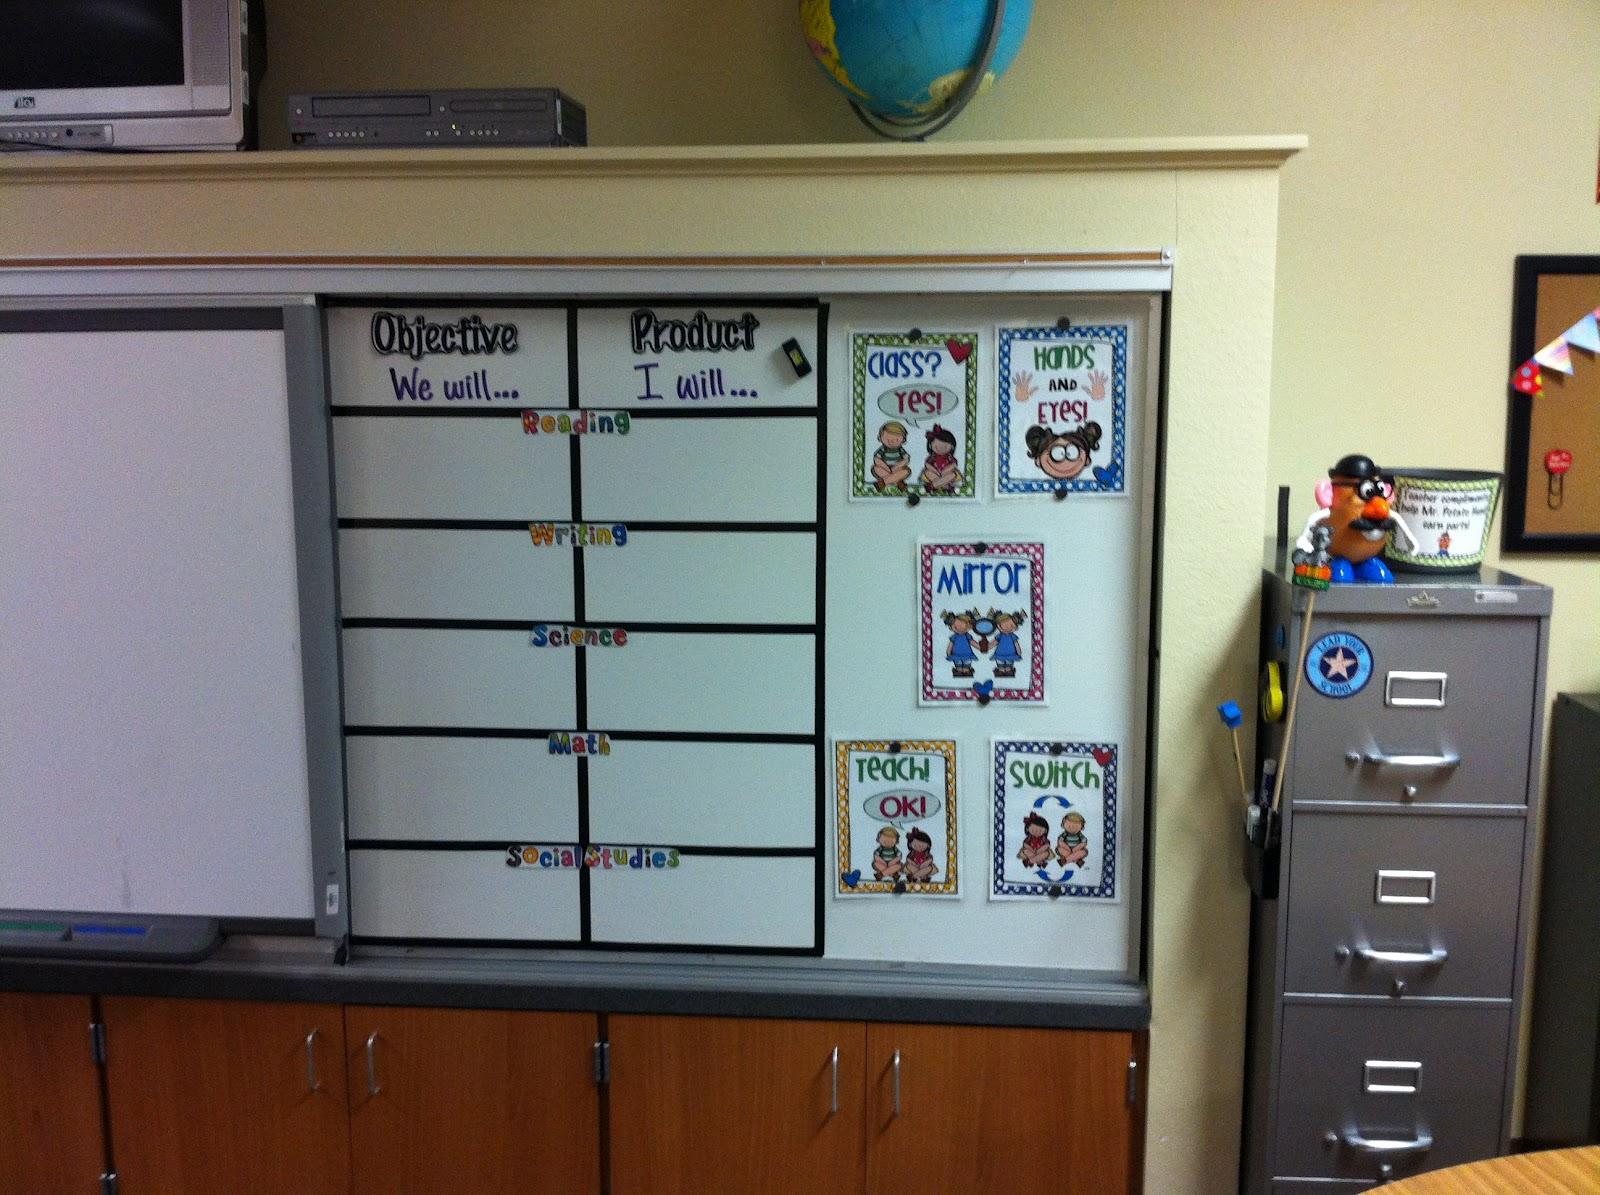 IMG_2487 Clothes Worksheet Grade on 1 grade spelling, 5th grade worksheets, 1 grade flash cards, for first grade phonics worksheets, 1 grade crafts, 1 grade reading, 1 grade teachers, 7 grade worksheets, 4 grade worksheets, 1 grade poems, fall first grade addition worksheets, 1st grade grammar worksheets, 1 grade coloring pages, 2 grade worksheets, for 1st grade reading worksheets, 1 grade clip art, 1 grade math, 1 grade work, 1st grade reading comprehension worksheets, 1st grade writing worksheets,